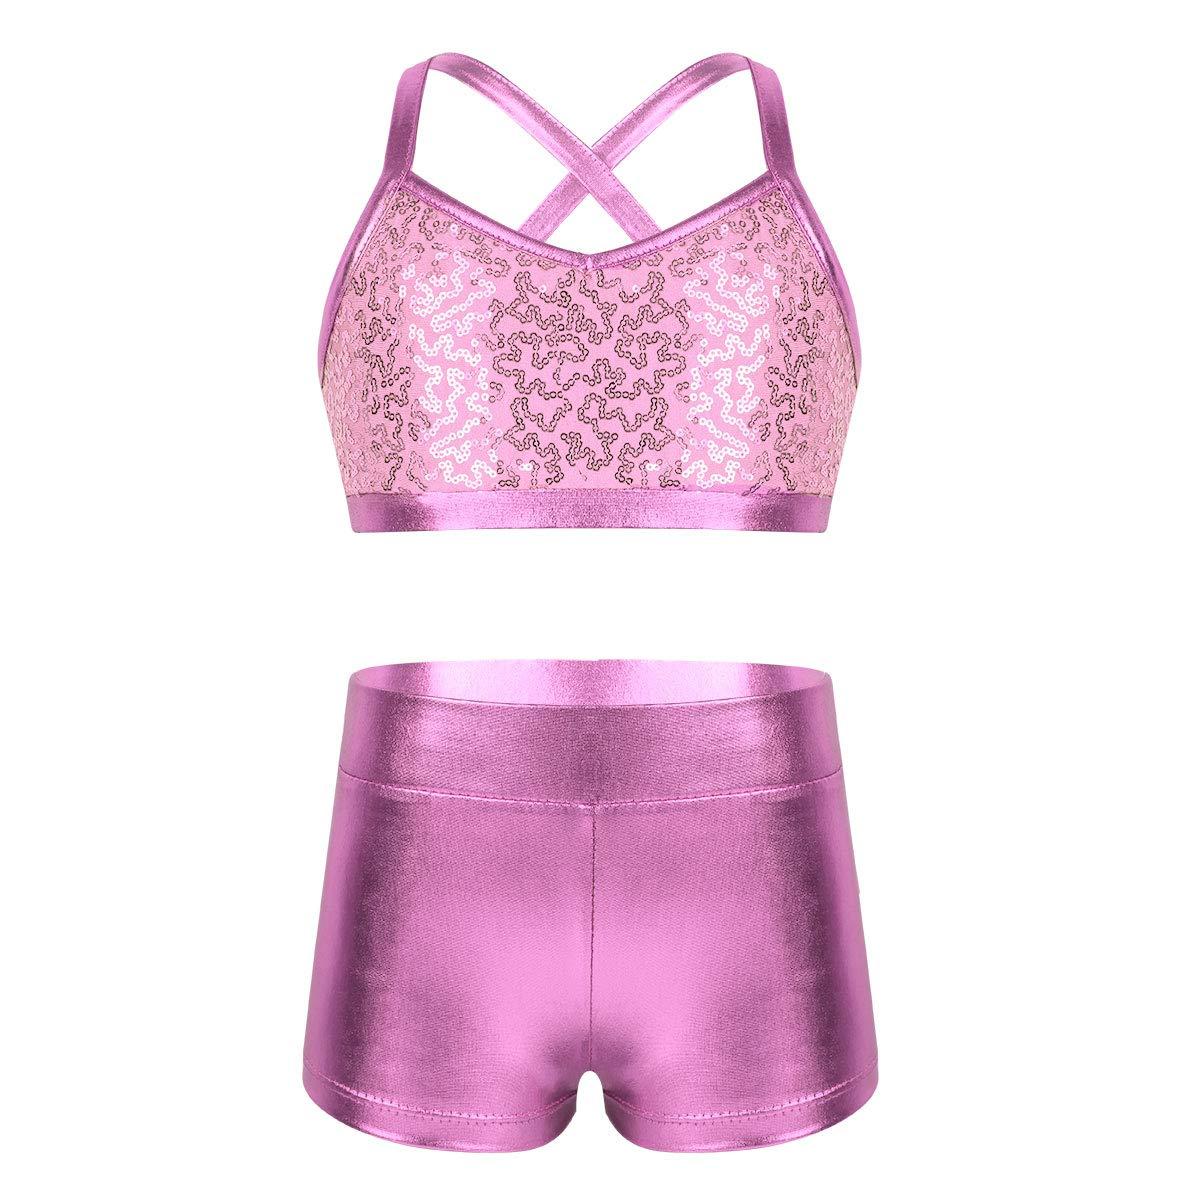 MSemis Kids Girls Shiny Sequins Metallic Ballet Gymnastics Leotard Dance Outfits Crisscross Back Crop Top with Shorts